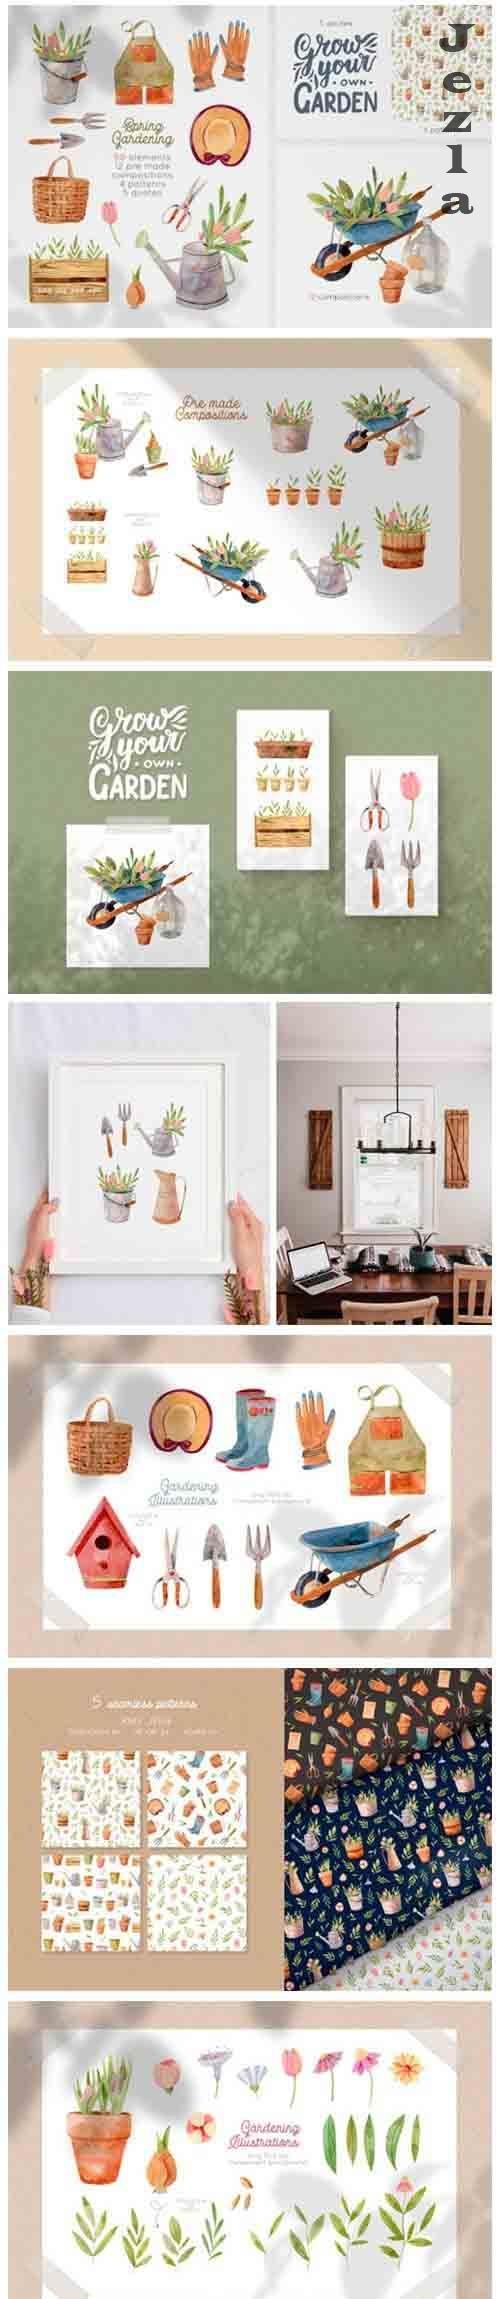 Gardening Tools Clipart - 4496180